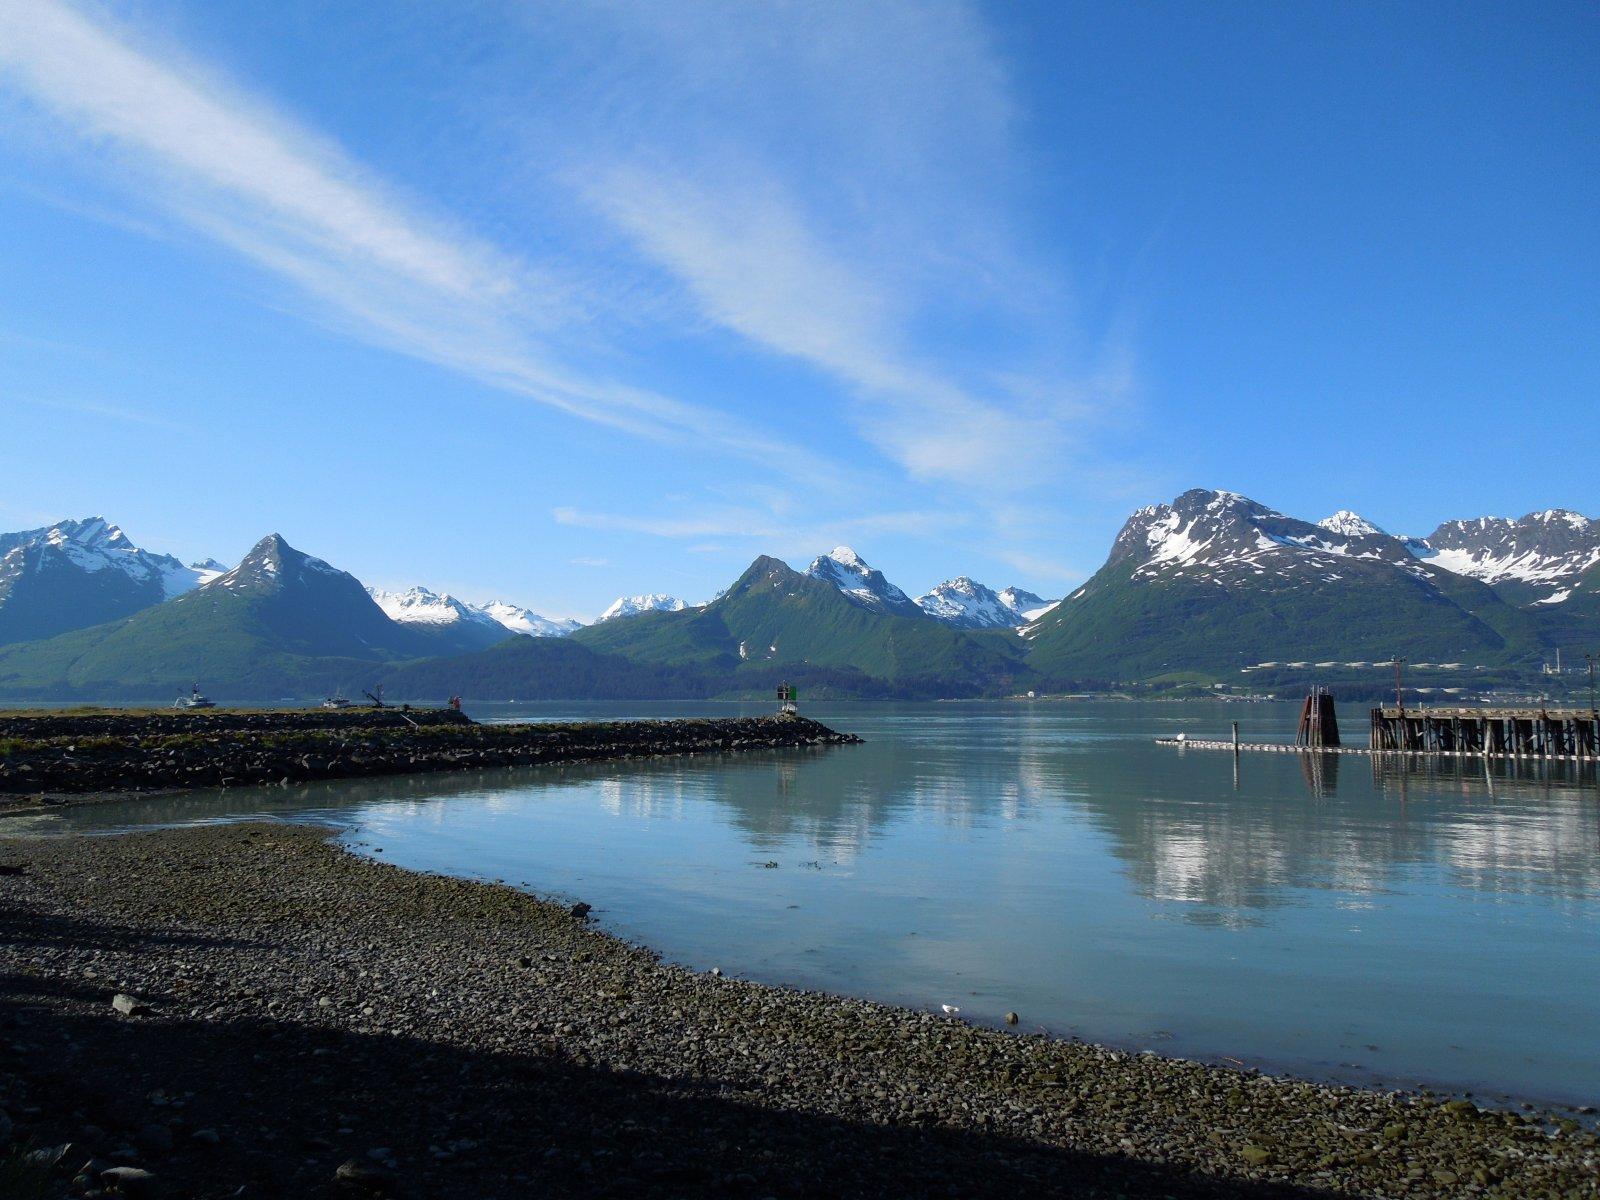 Click image for larger version  Name:Valdez to Copper River Center 103.jpg Views:58 Size:287.4 KB ID:215362